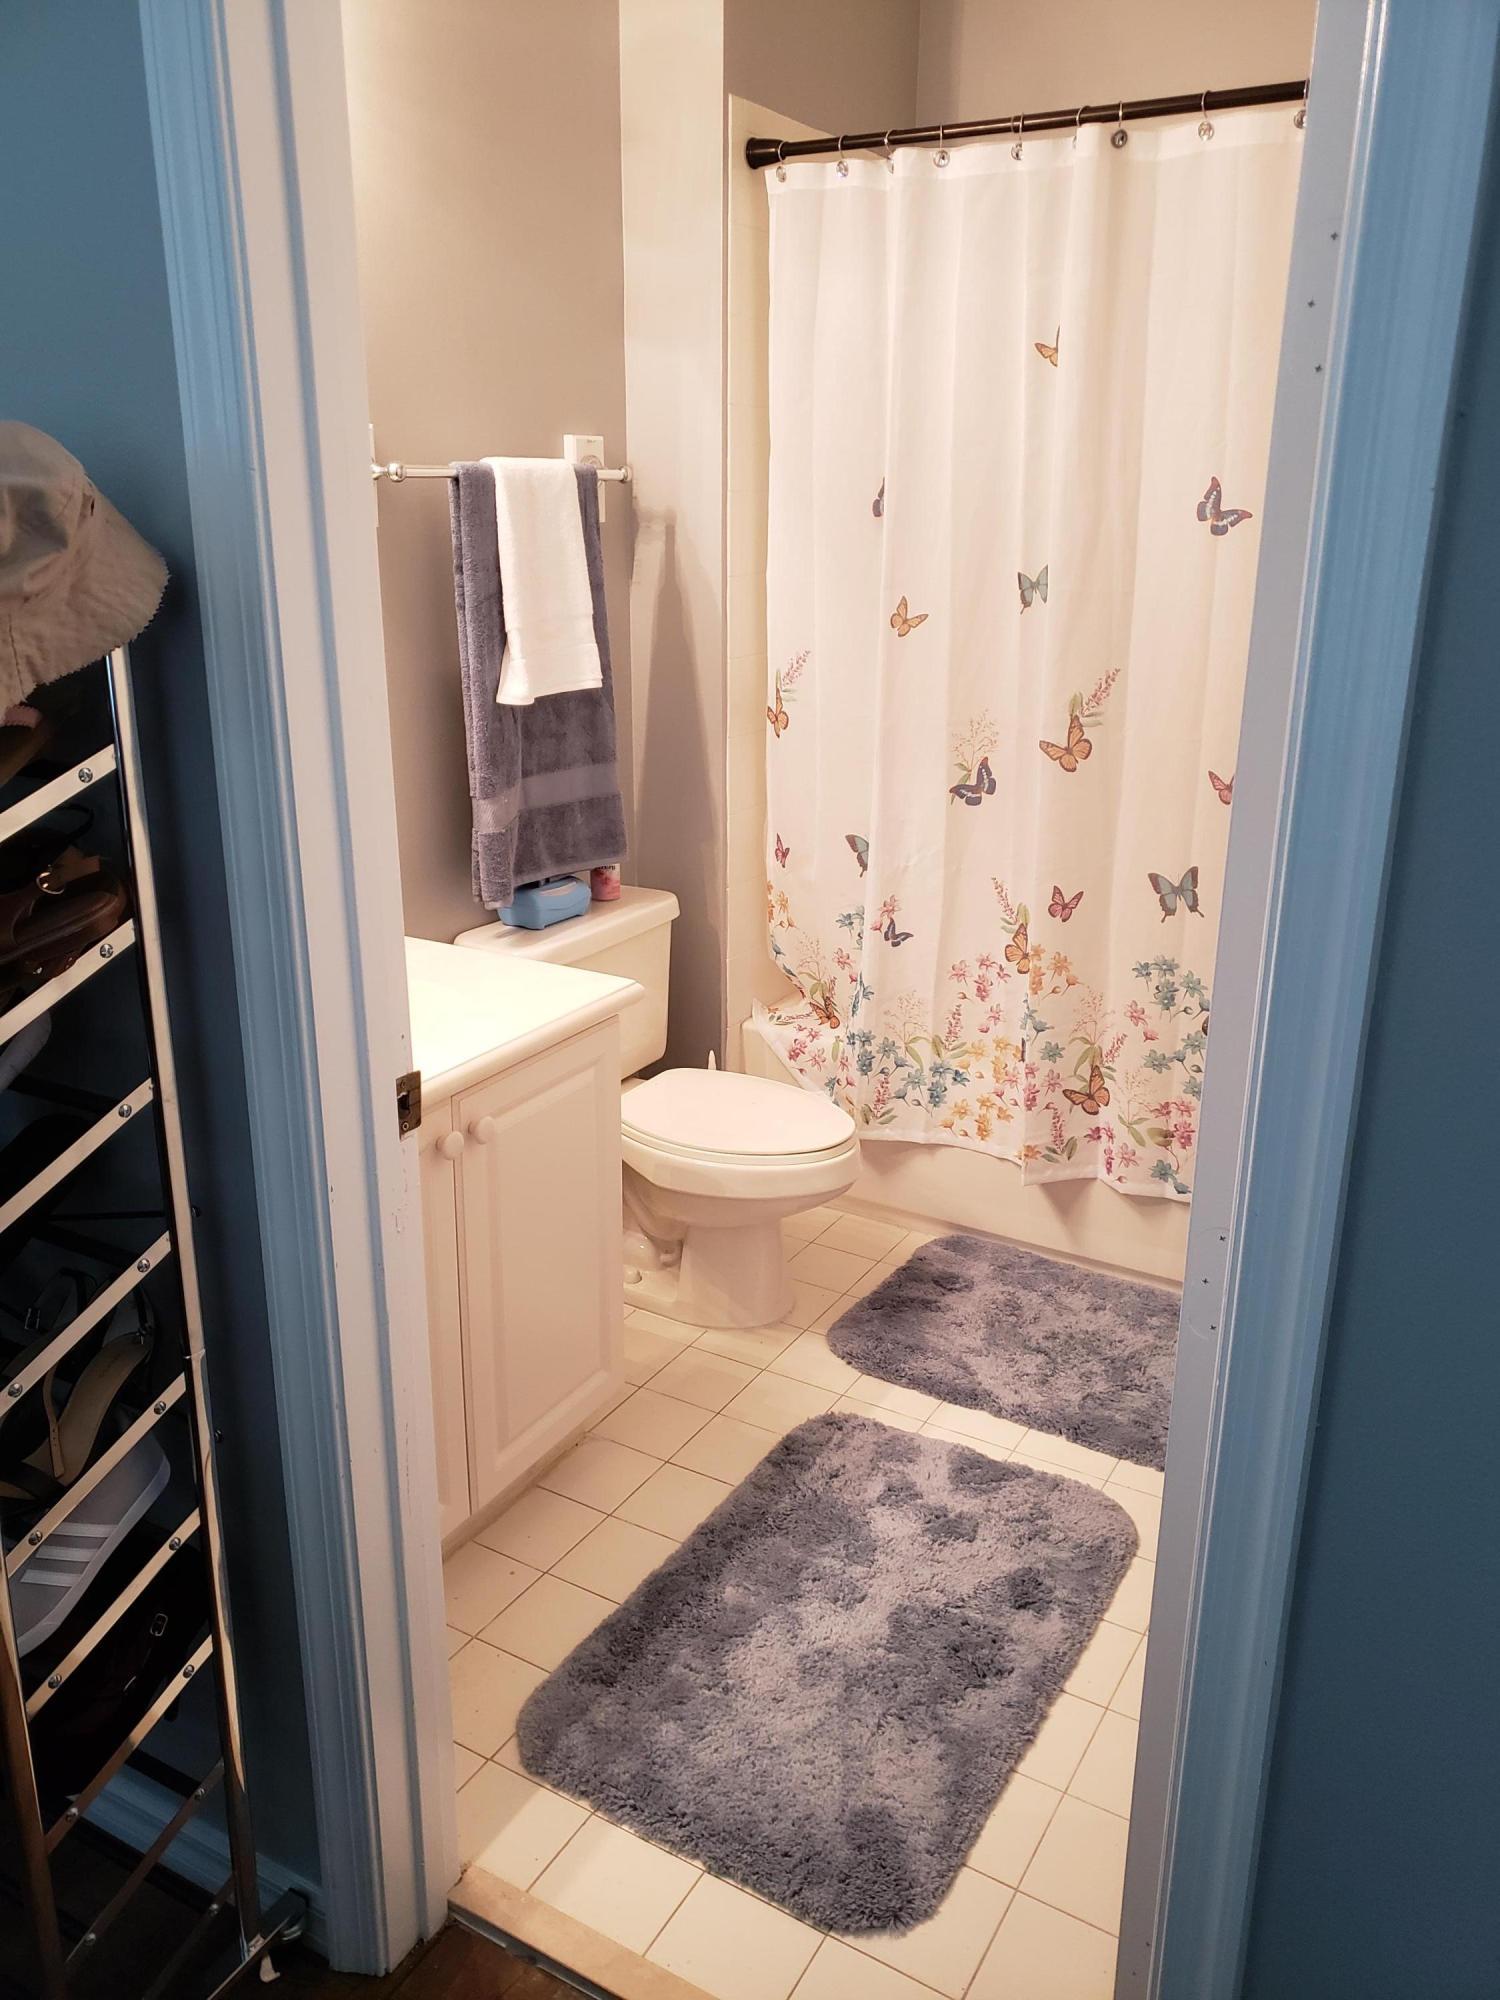 4324 Main Street, Jupiter, Florida 33458, 3 Bedrooms Bedrooms, ,3.1 BathroomsBathrooms,A,Townhouse,Main,RX-10503155